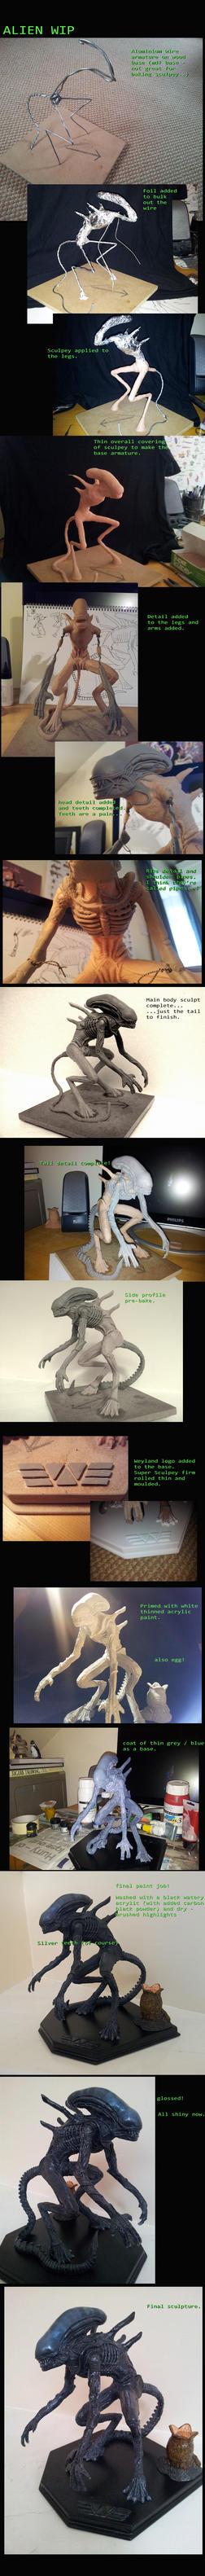 ALIEN Xenomorph (Sculpey statue) WIP by LewisMoss